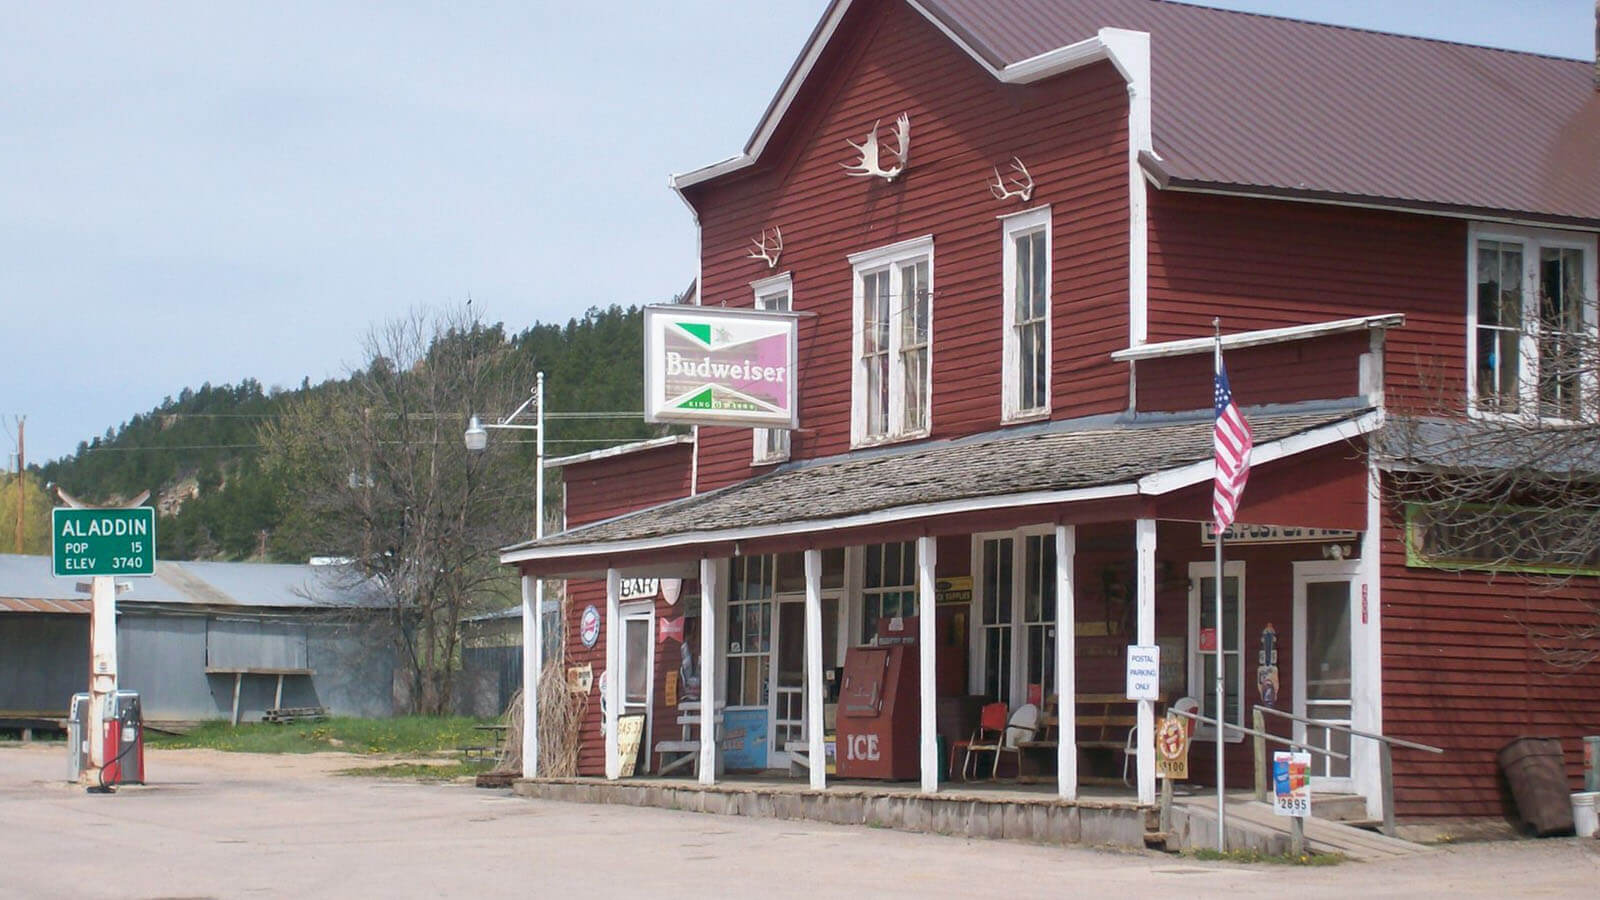 Aladdin Wyoming Post Office